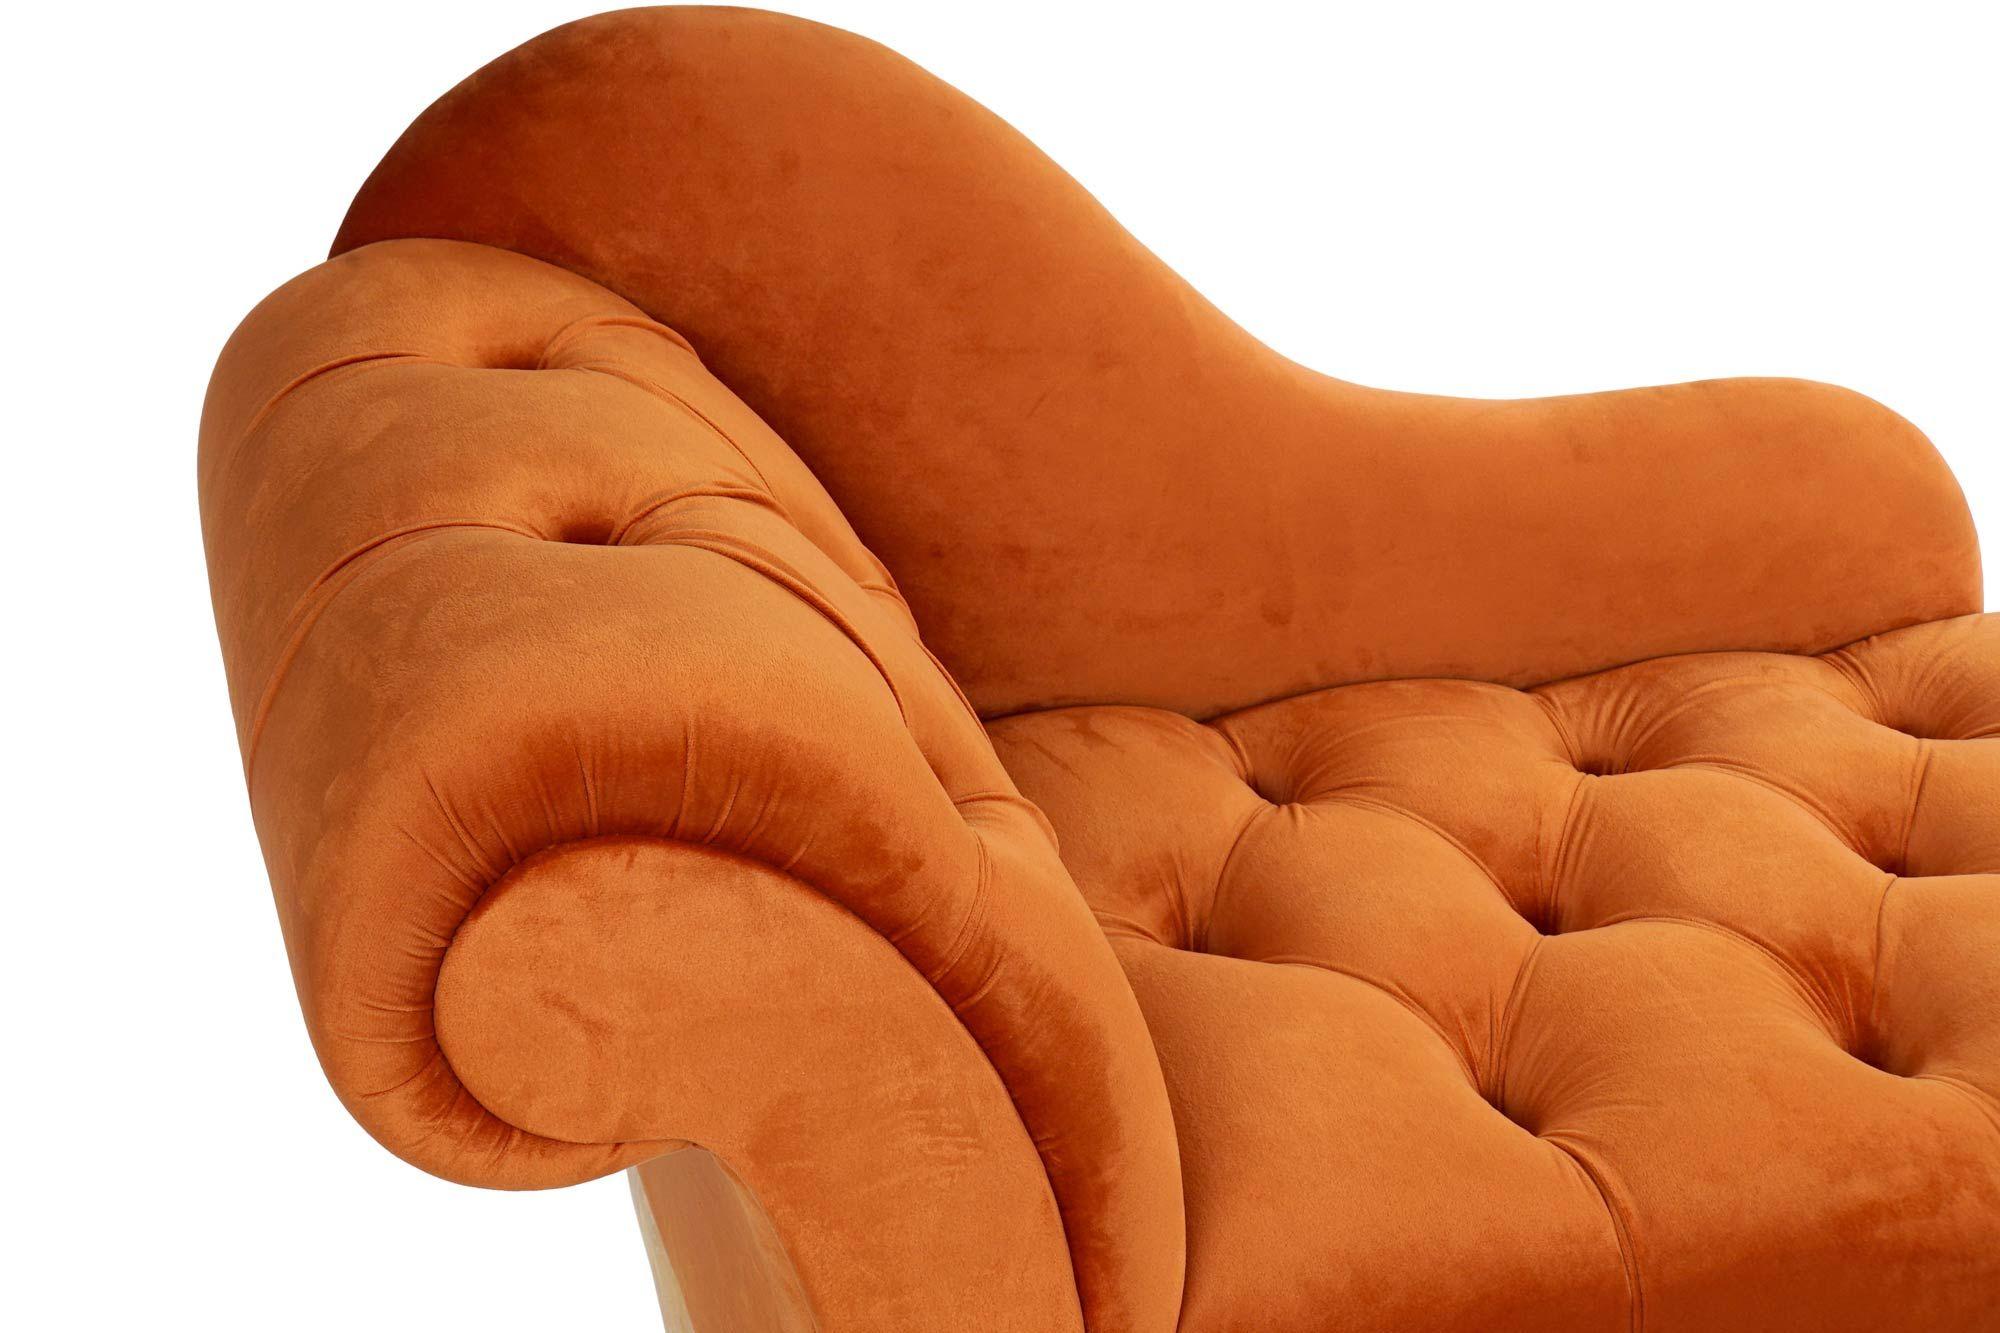 30091-chaiselongue-terciopelo-naranja-tostado-1.jpg